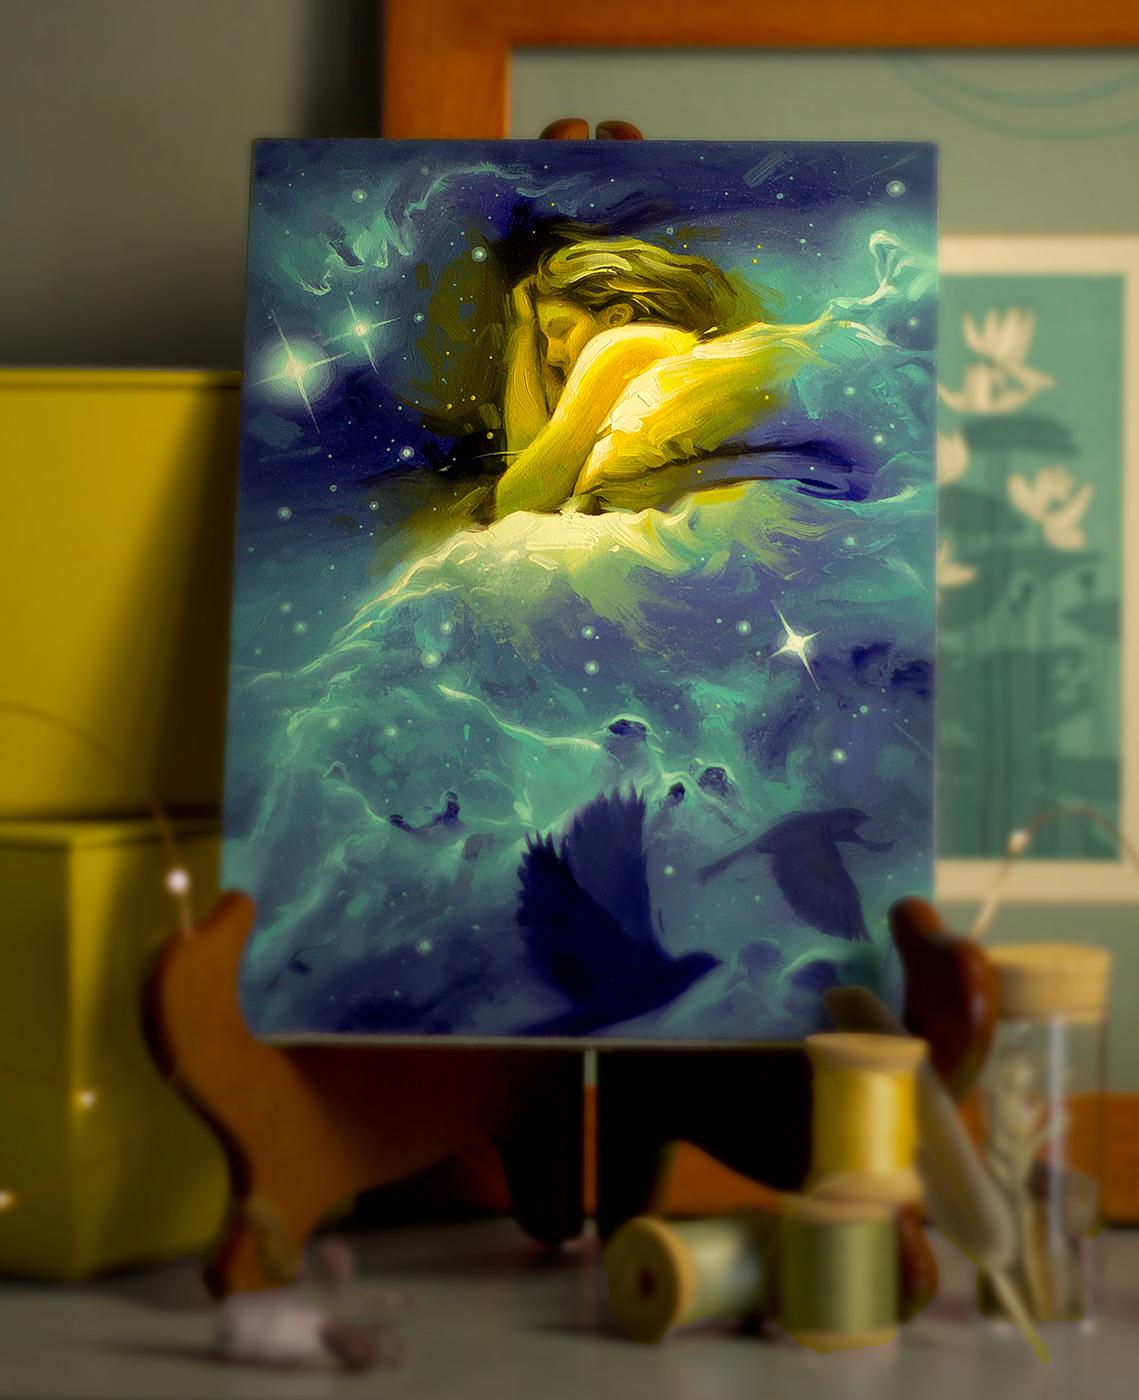 Nestled In The Nebulae by Rob Rey